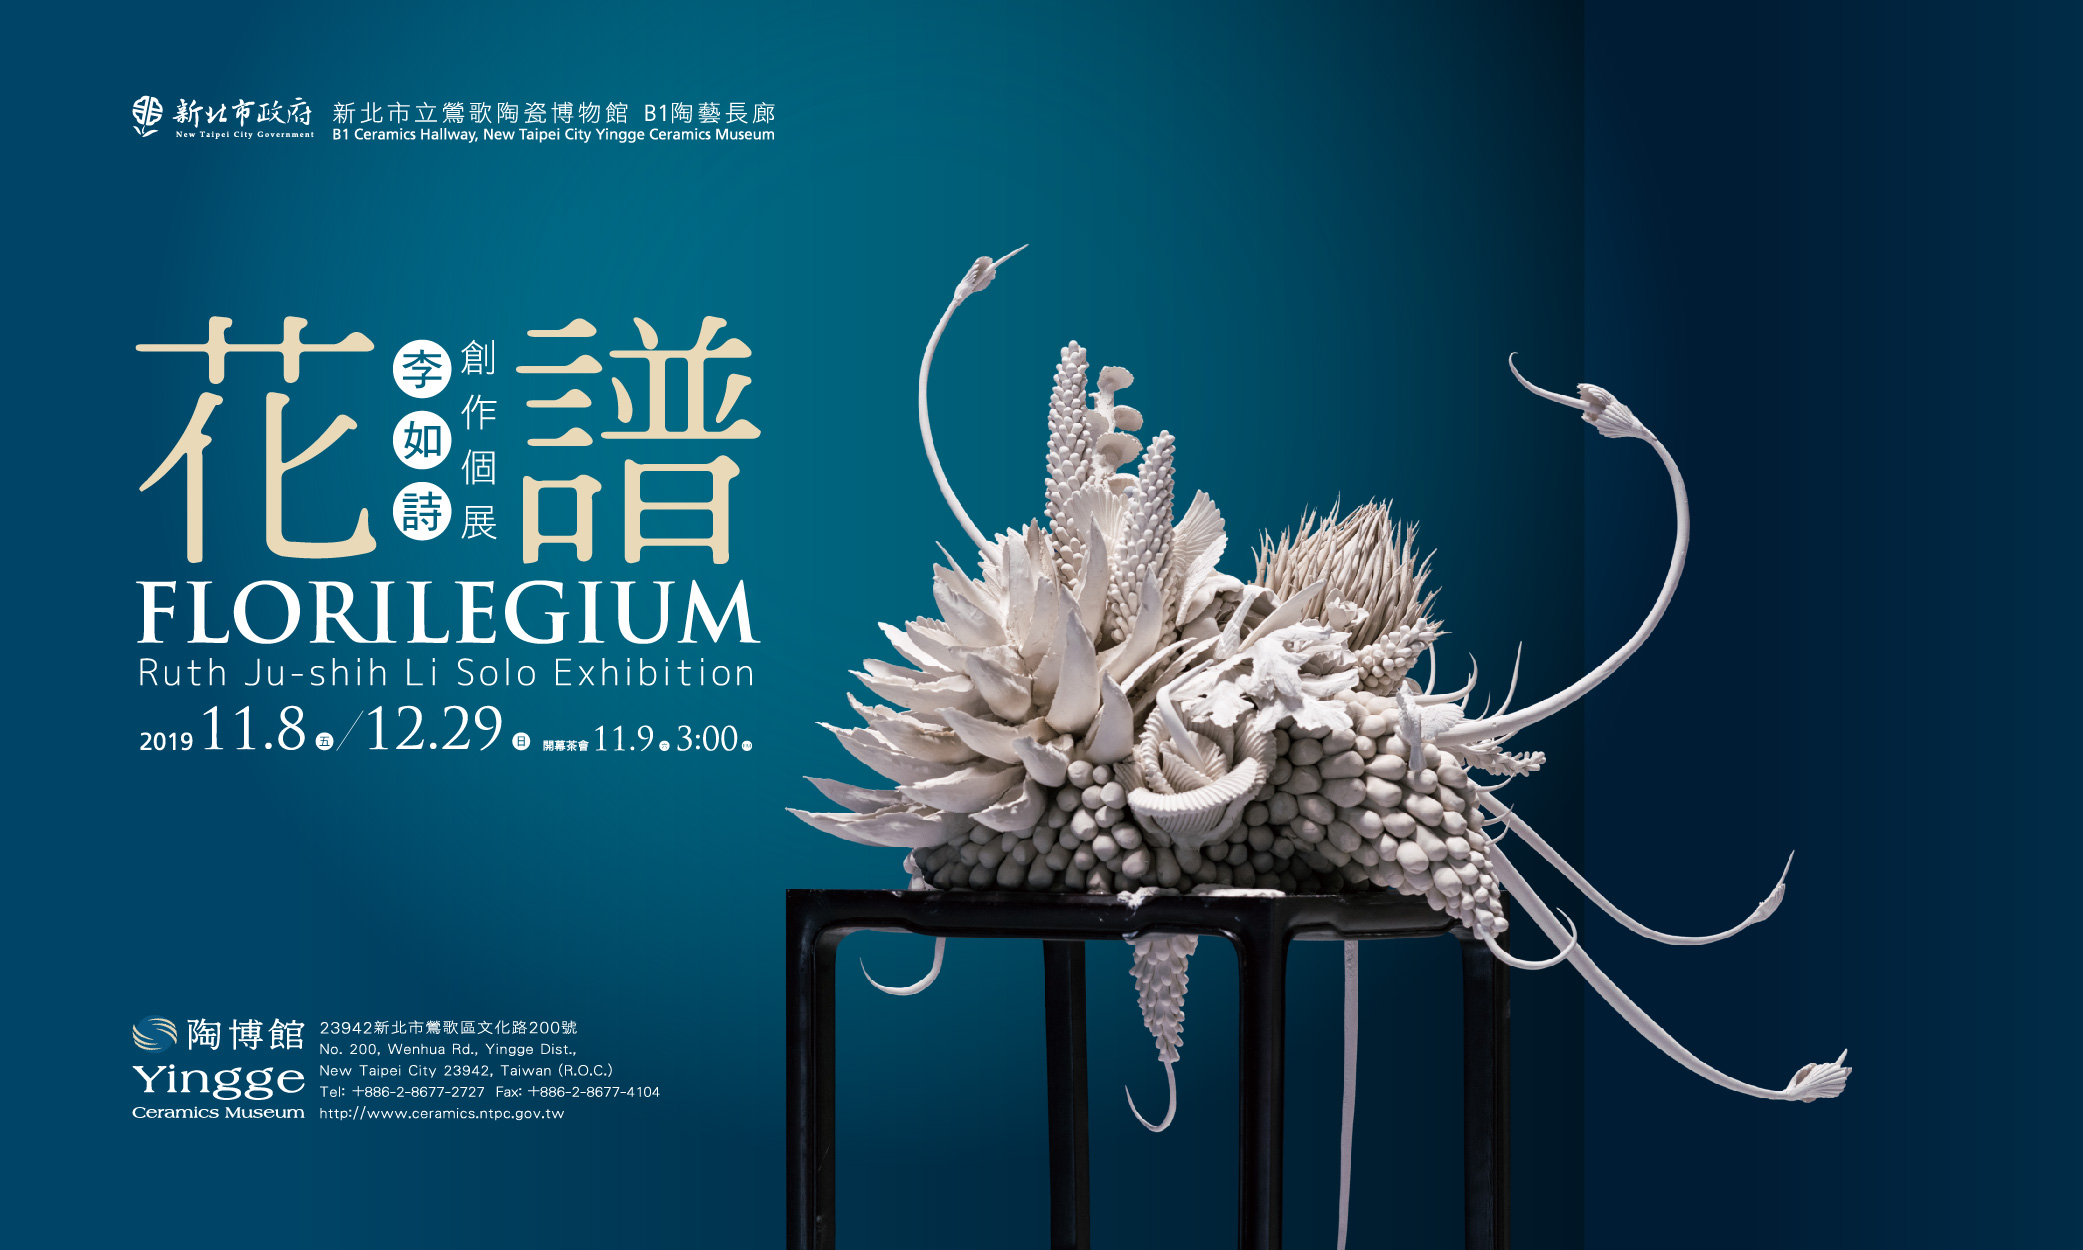 FLORILEGIUM: Ruth Ju-shih Li Solo Exhibition